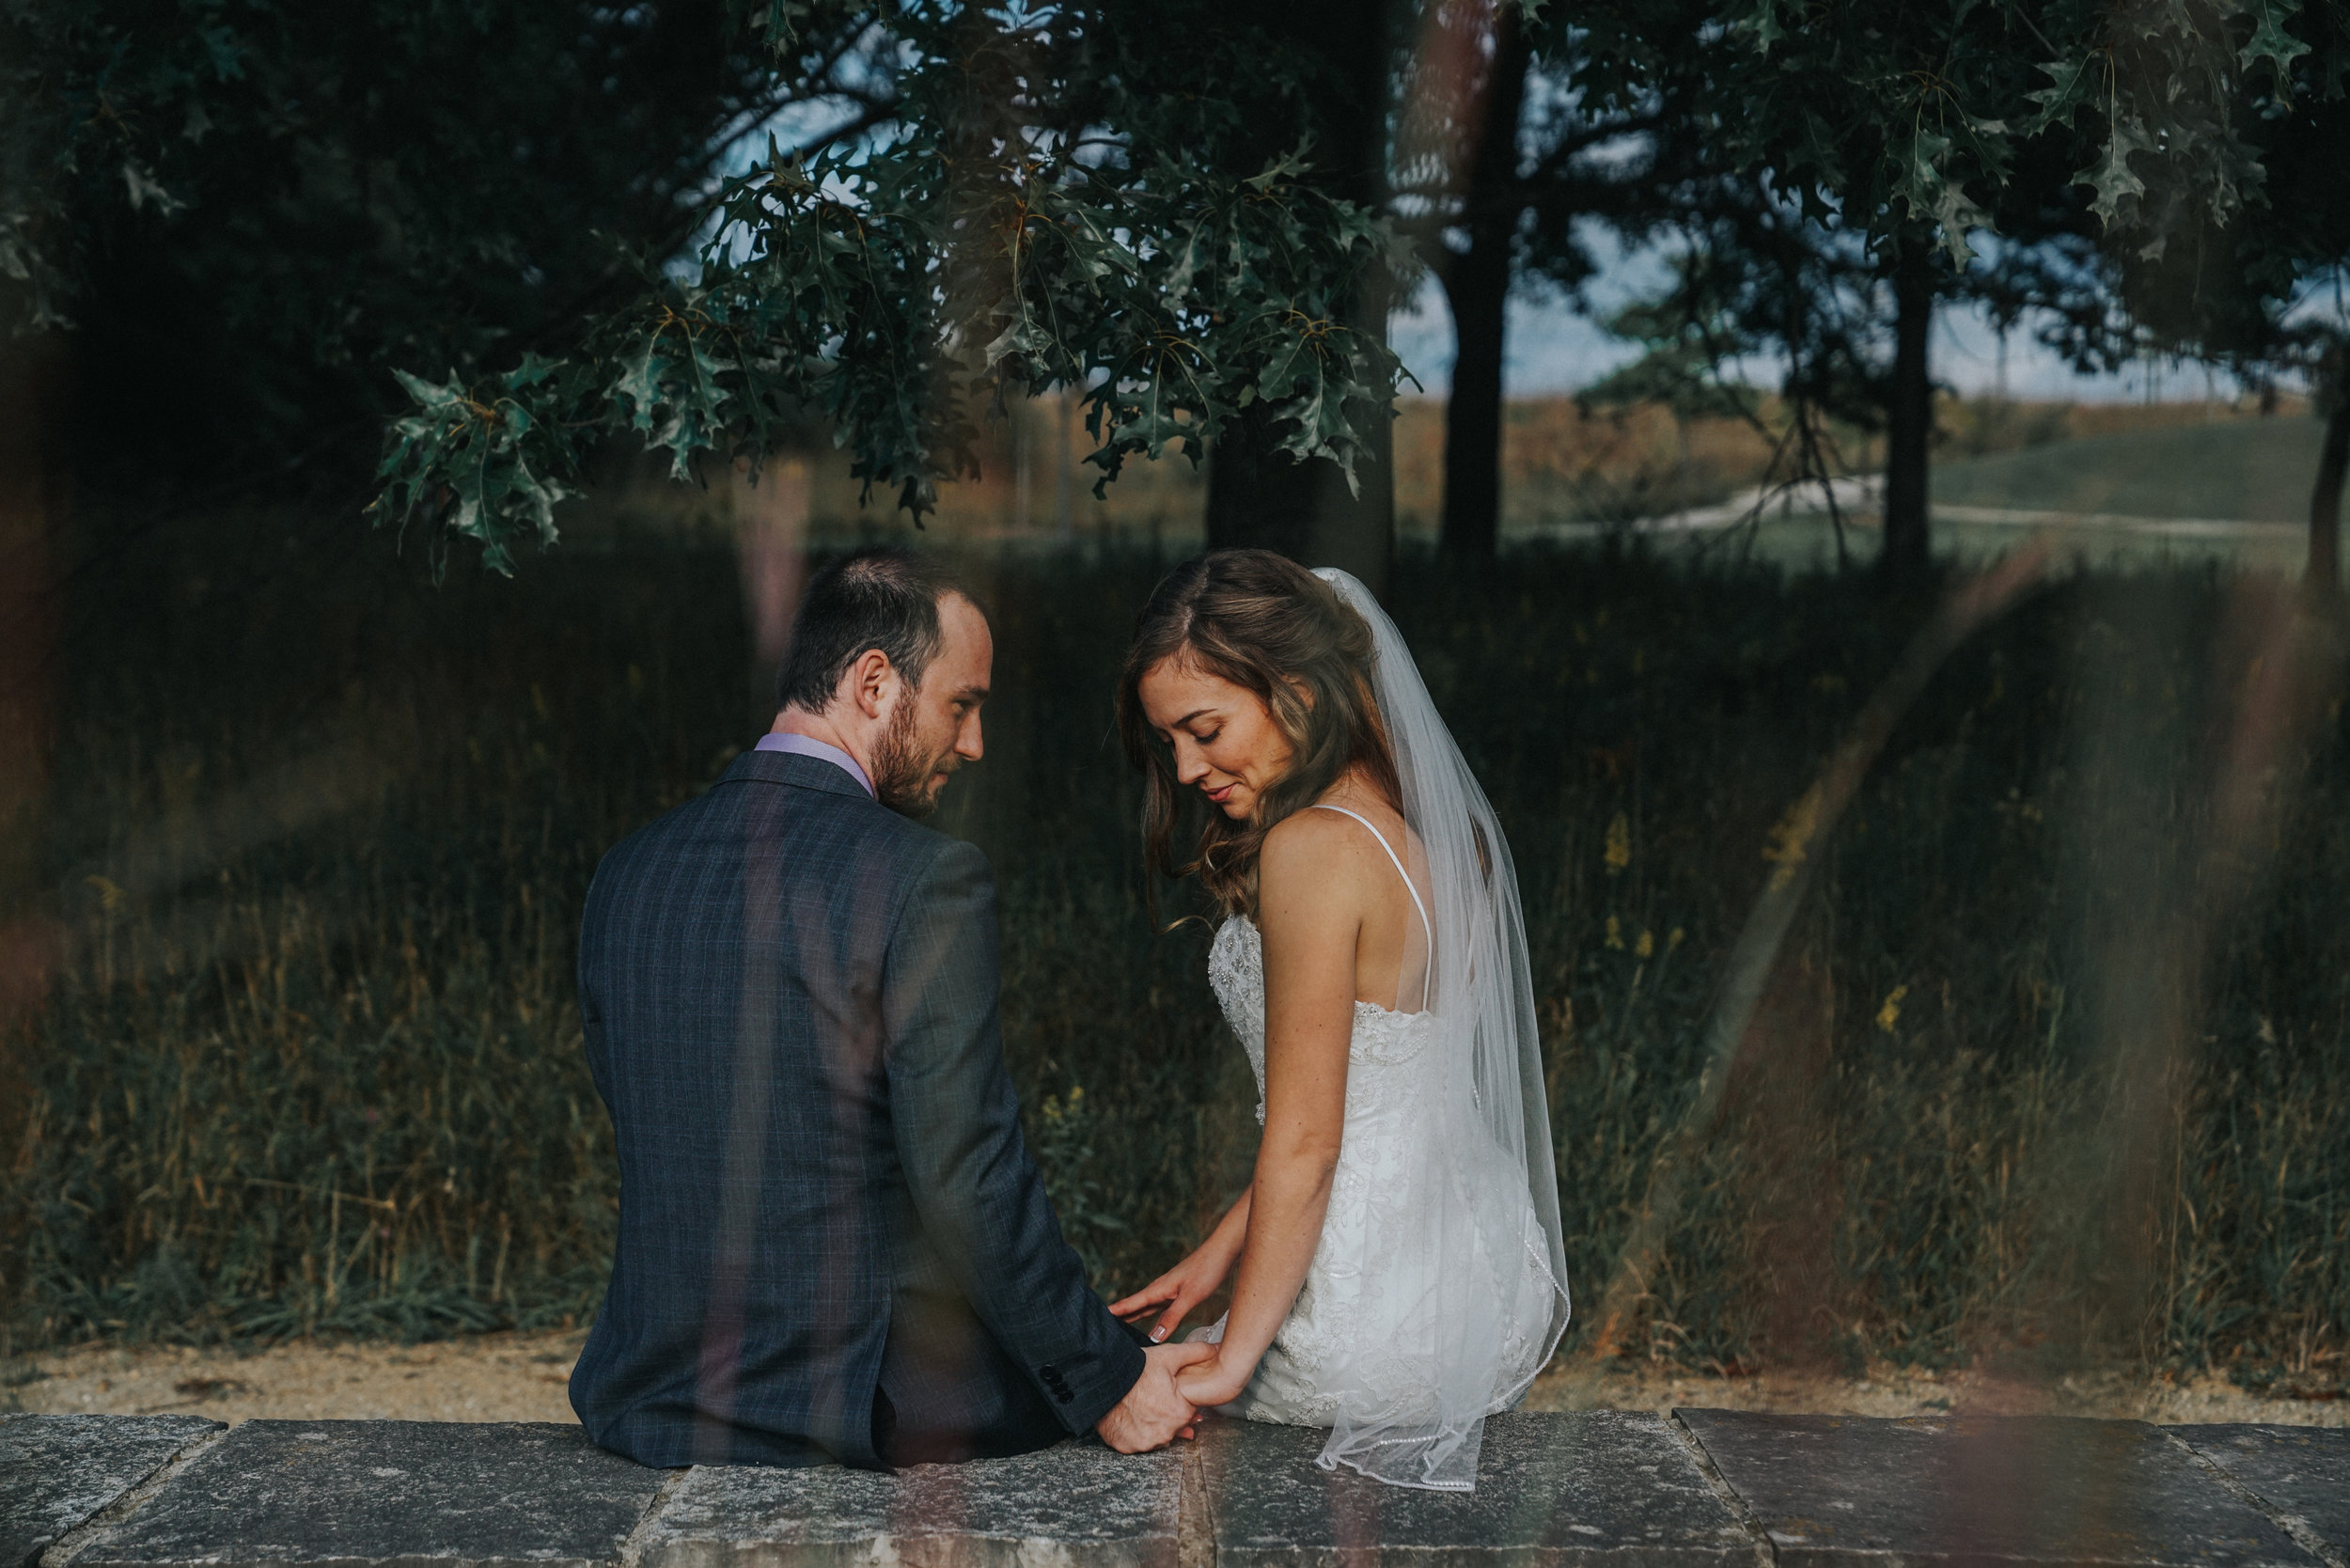 Intimate wedding at Indian Springs Metropark